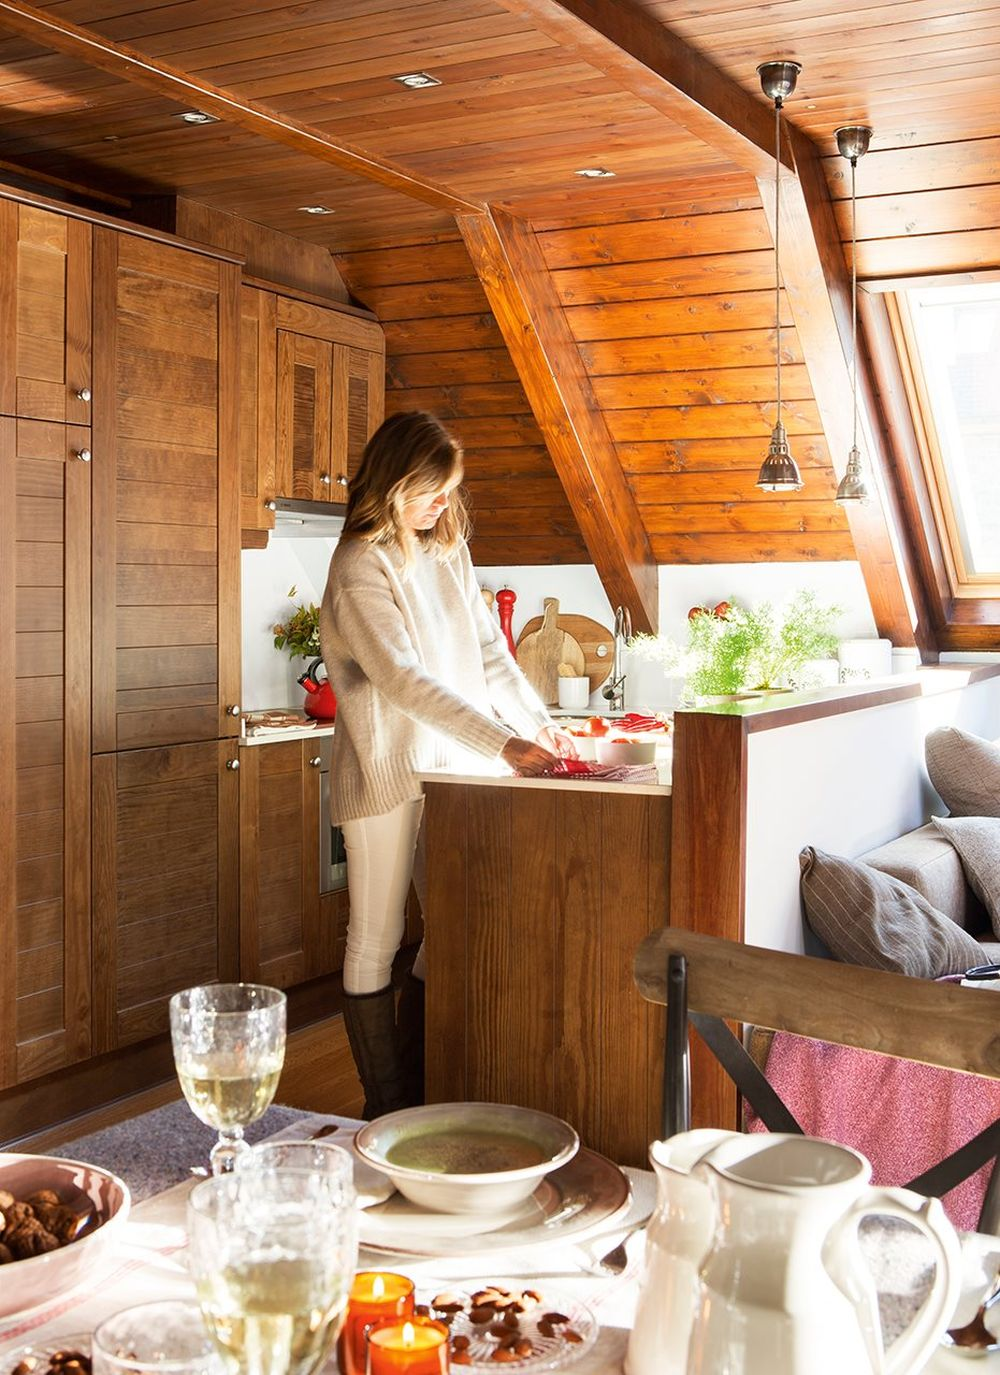 adelaparvu.com despre locuinta de vacanta la mansarda, designer Calorina Juanes, Foto ElMueble, Pepa Oromi (9)